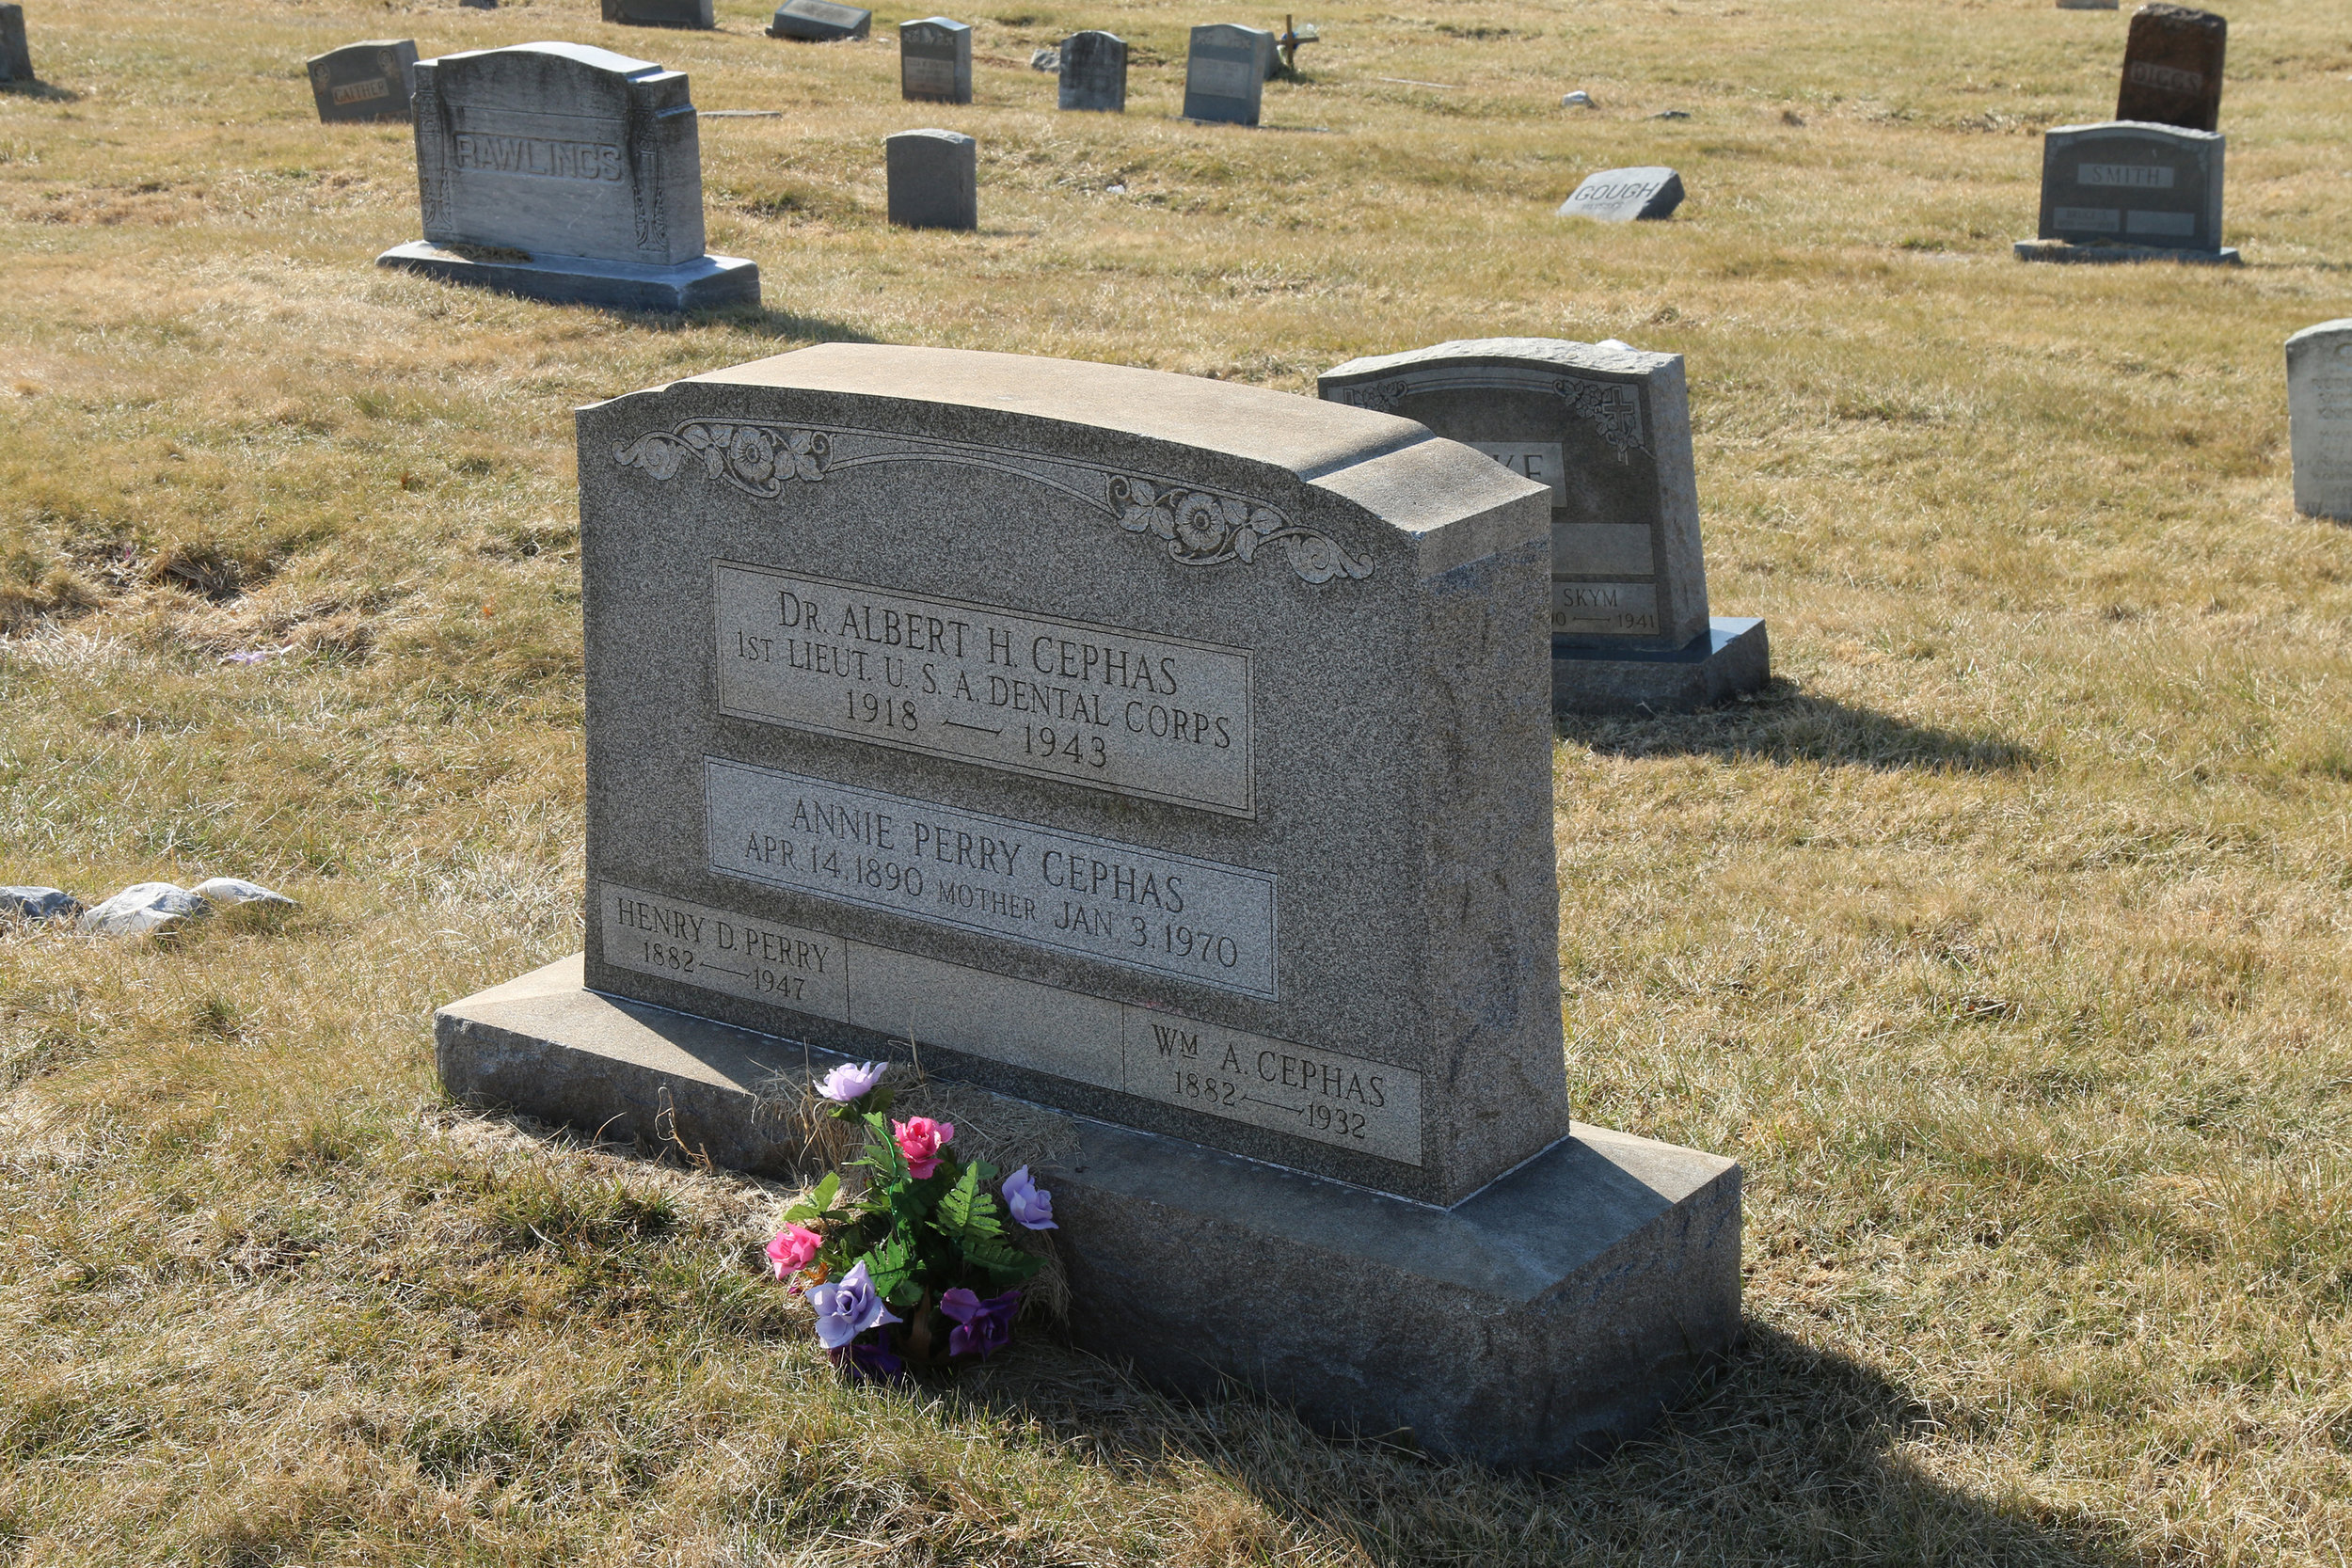 Lt. Albert H. Cephas